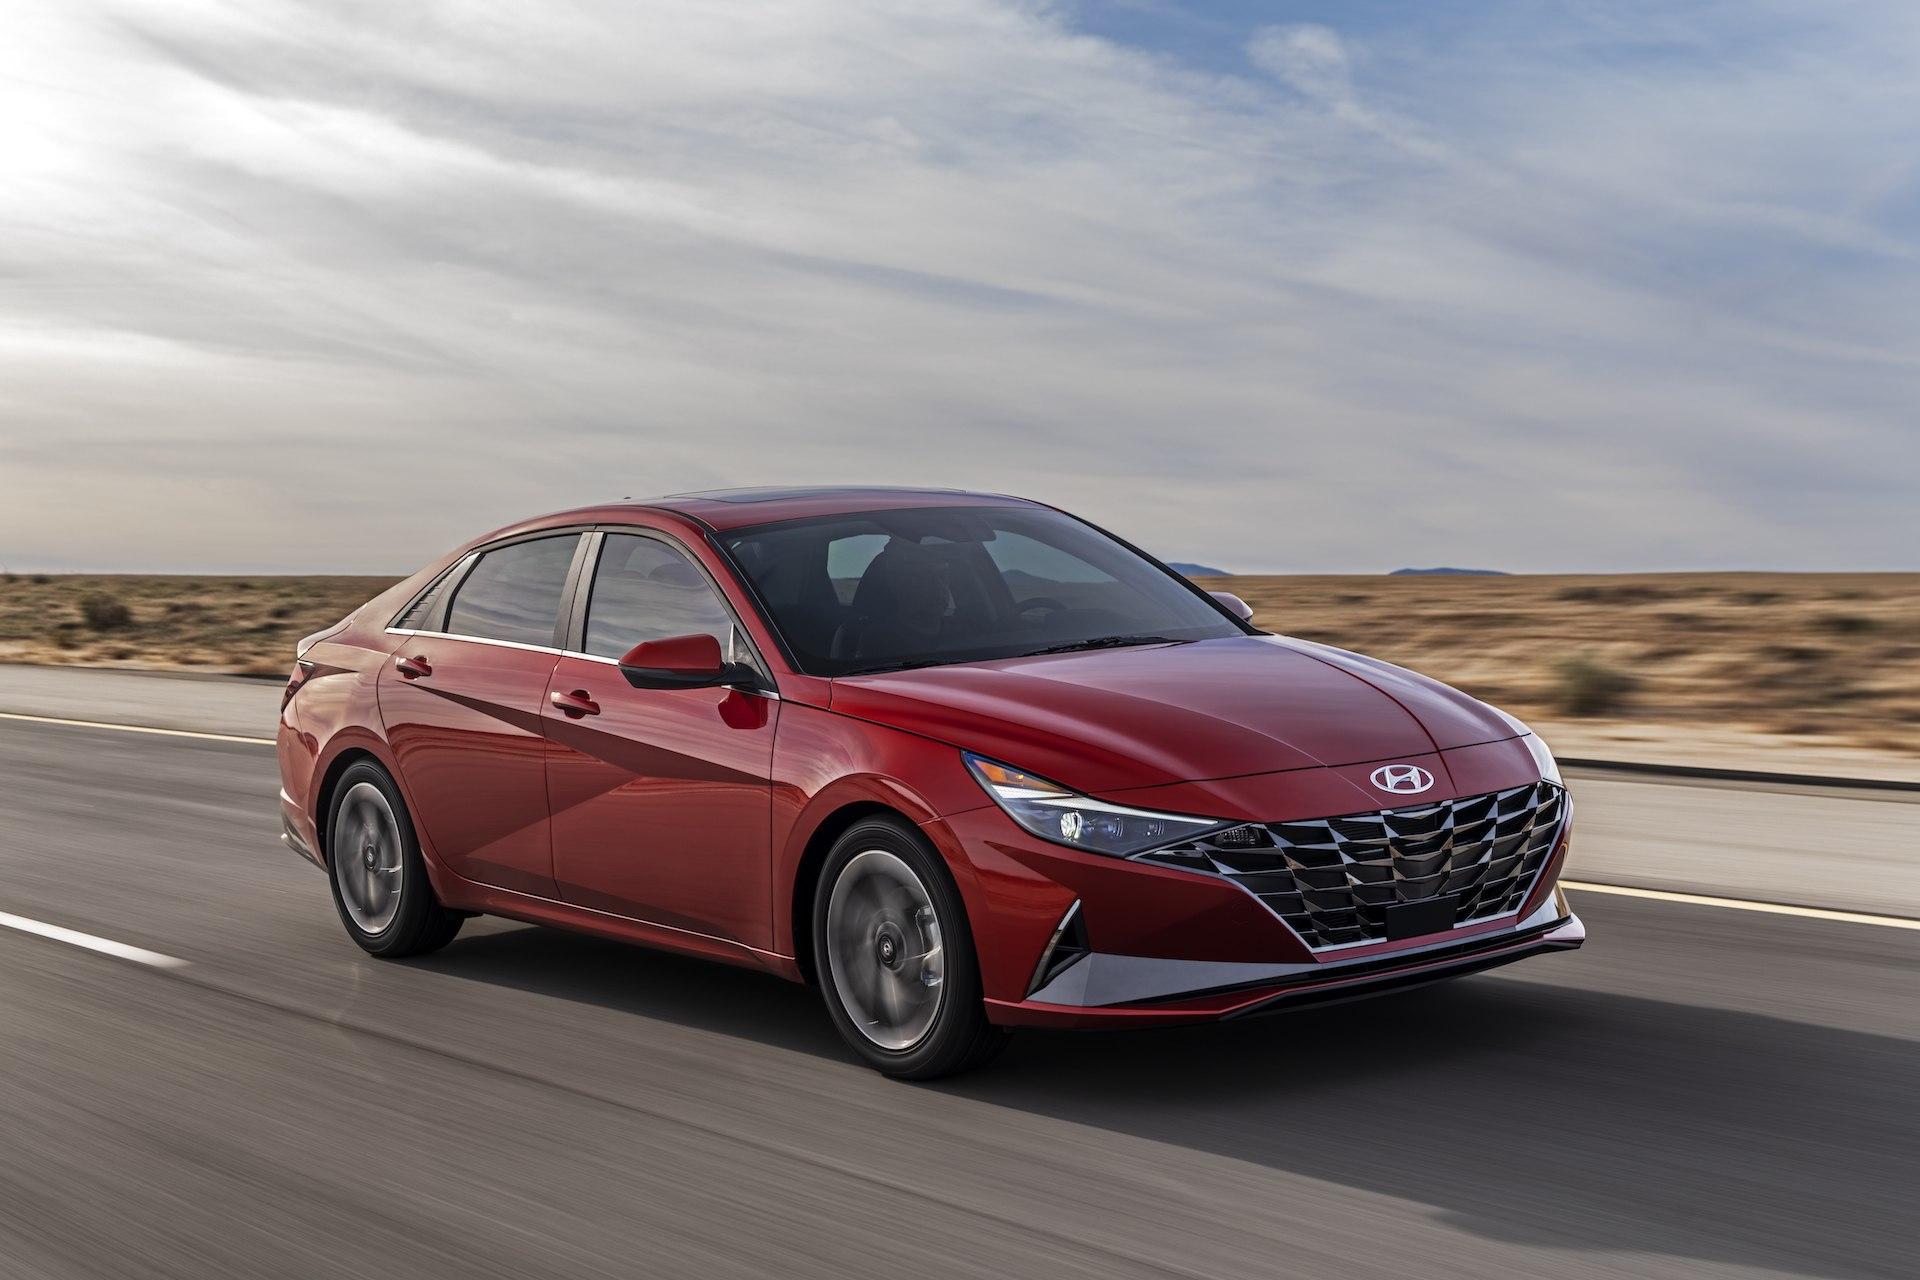 Redesign Hyundai Elantra 2021 Release Date